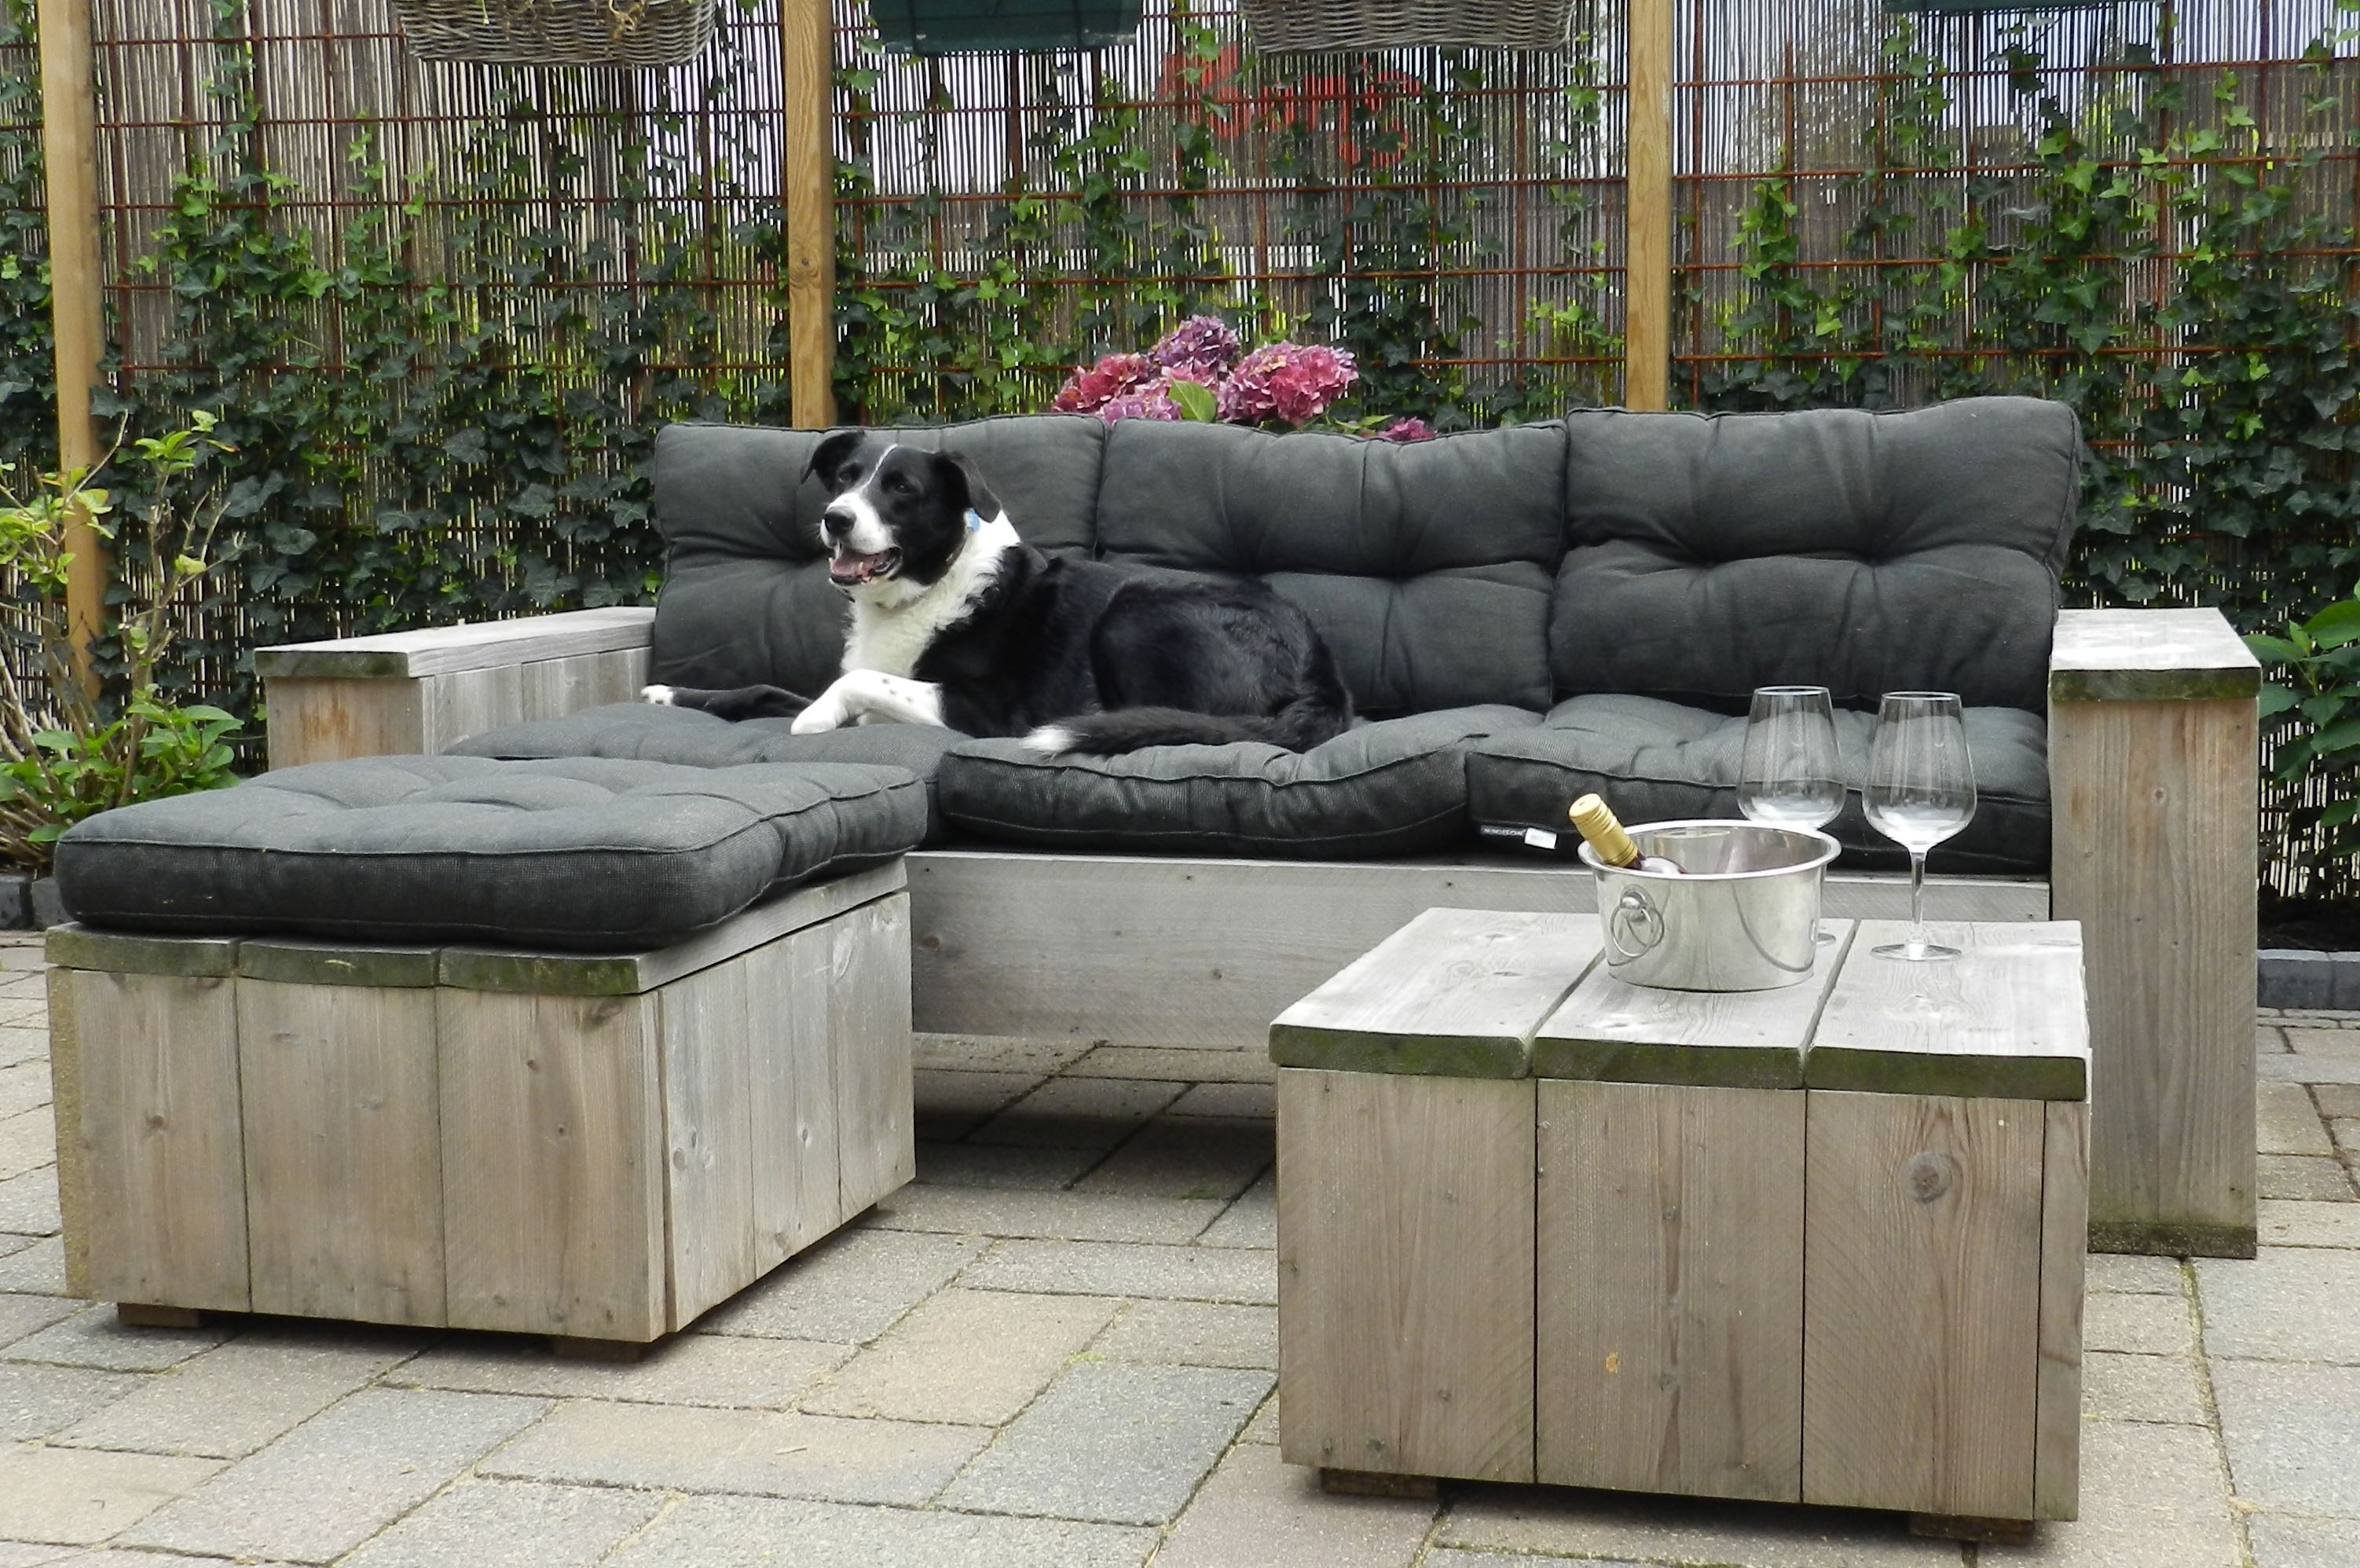 Tuinmeubilair sooph interieurarchitect hengelo - Tuin meubilair ...